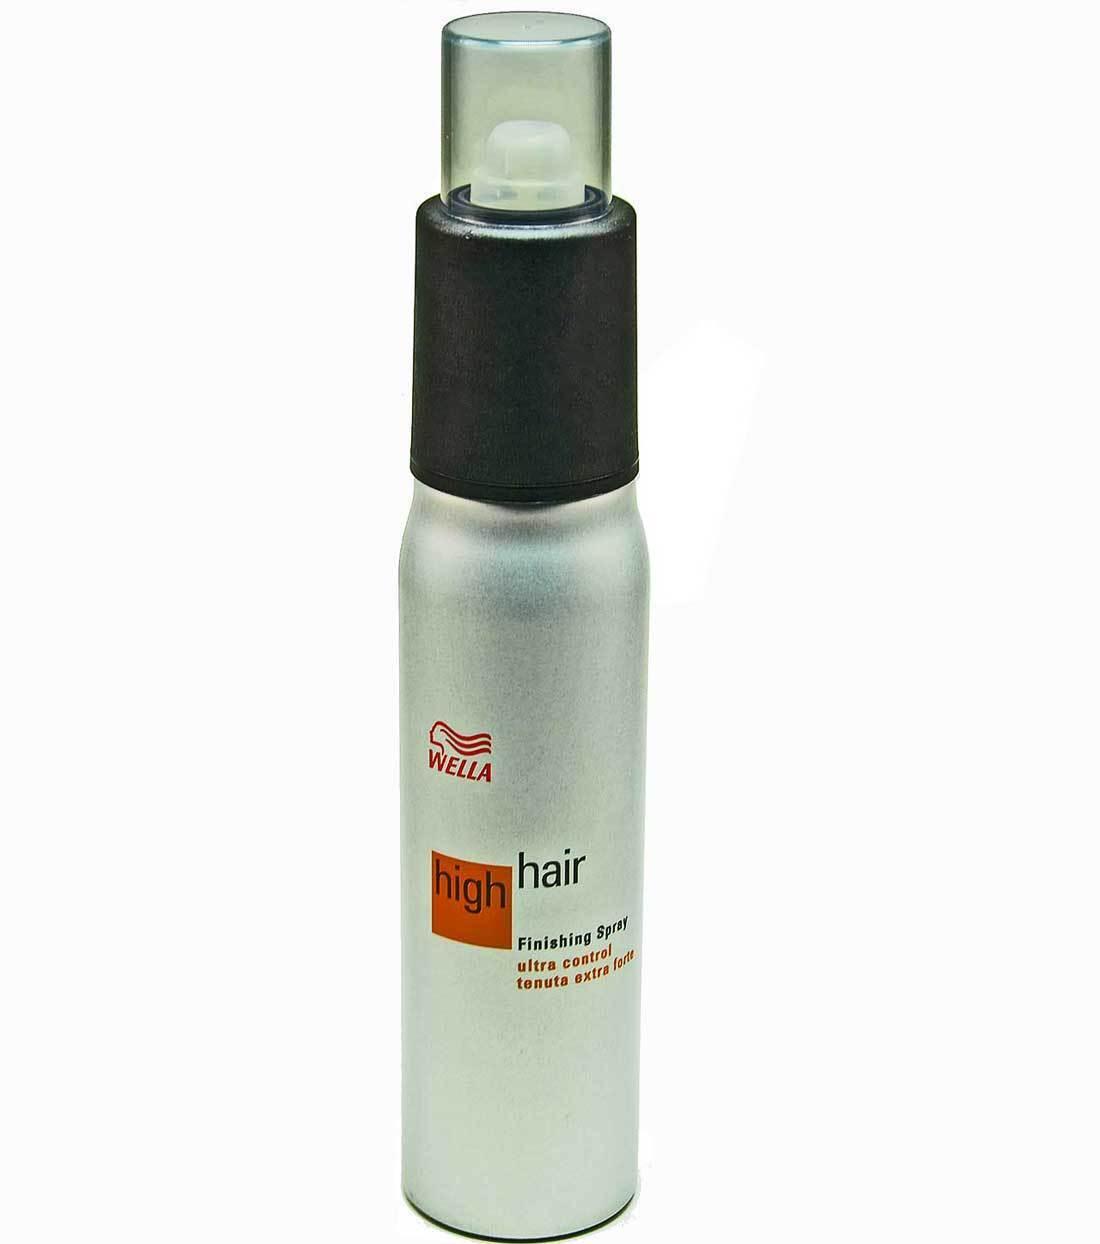 Wella High Hair Finishing Spray Haarlack - Ultra Starker Halt - 300ml